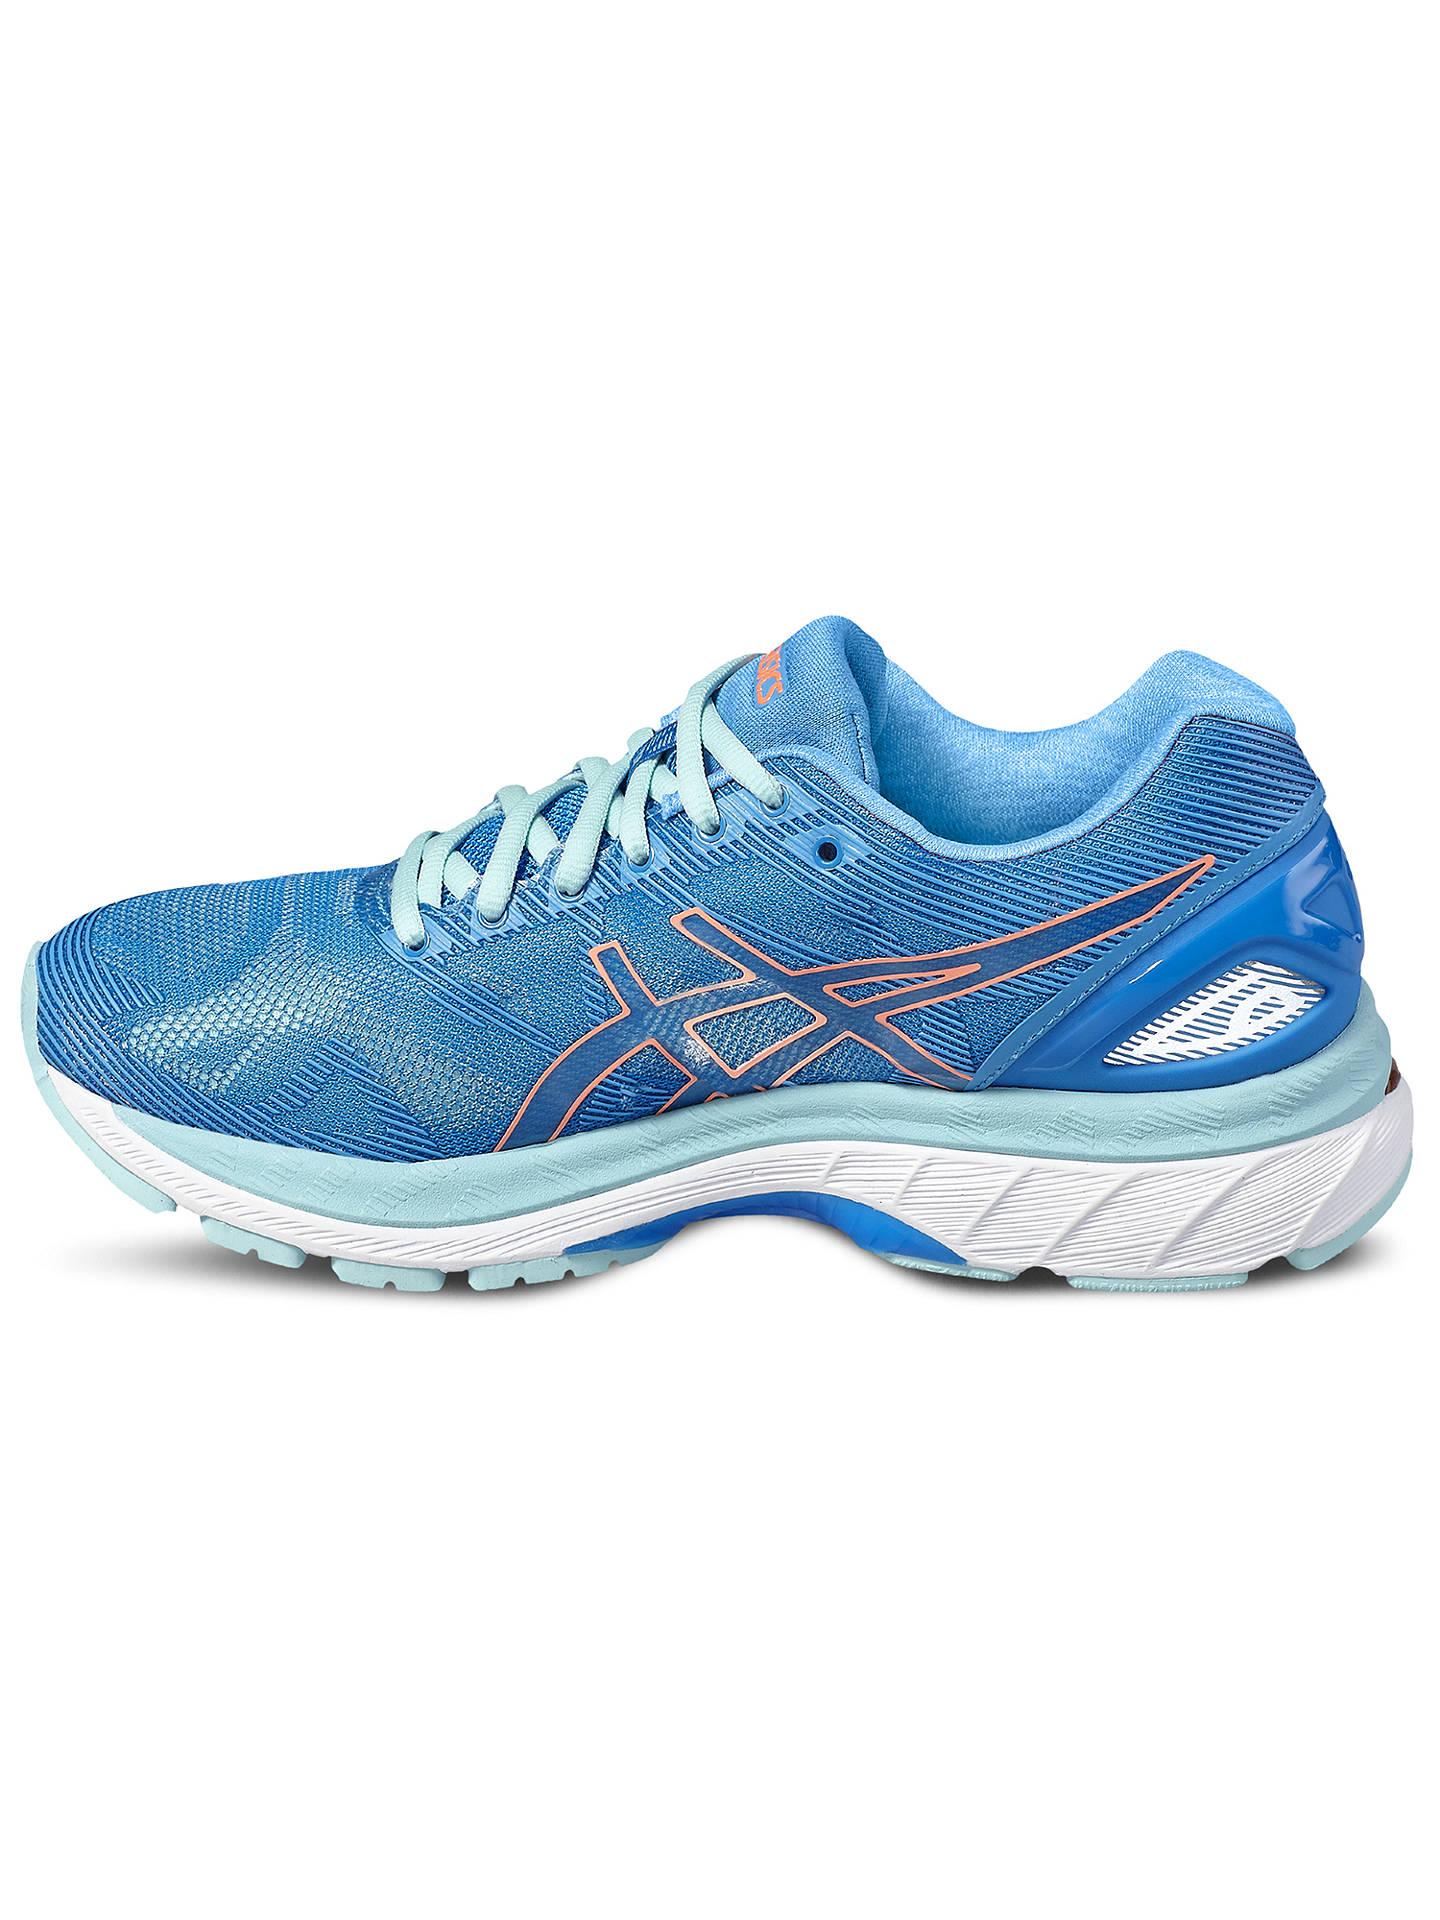 wholesale dealer 7d09c b2c93 Asics Gel-Nimbus 19 Women's Running Shoes, Blue/Pink at John ...